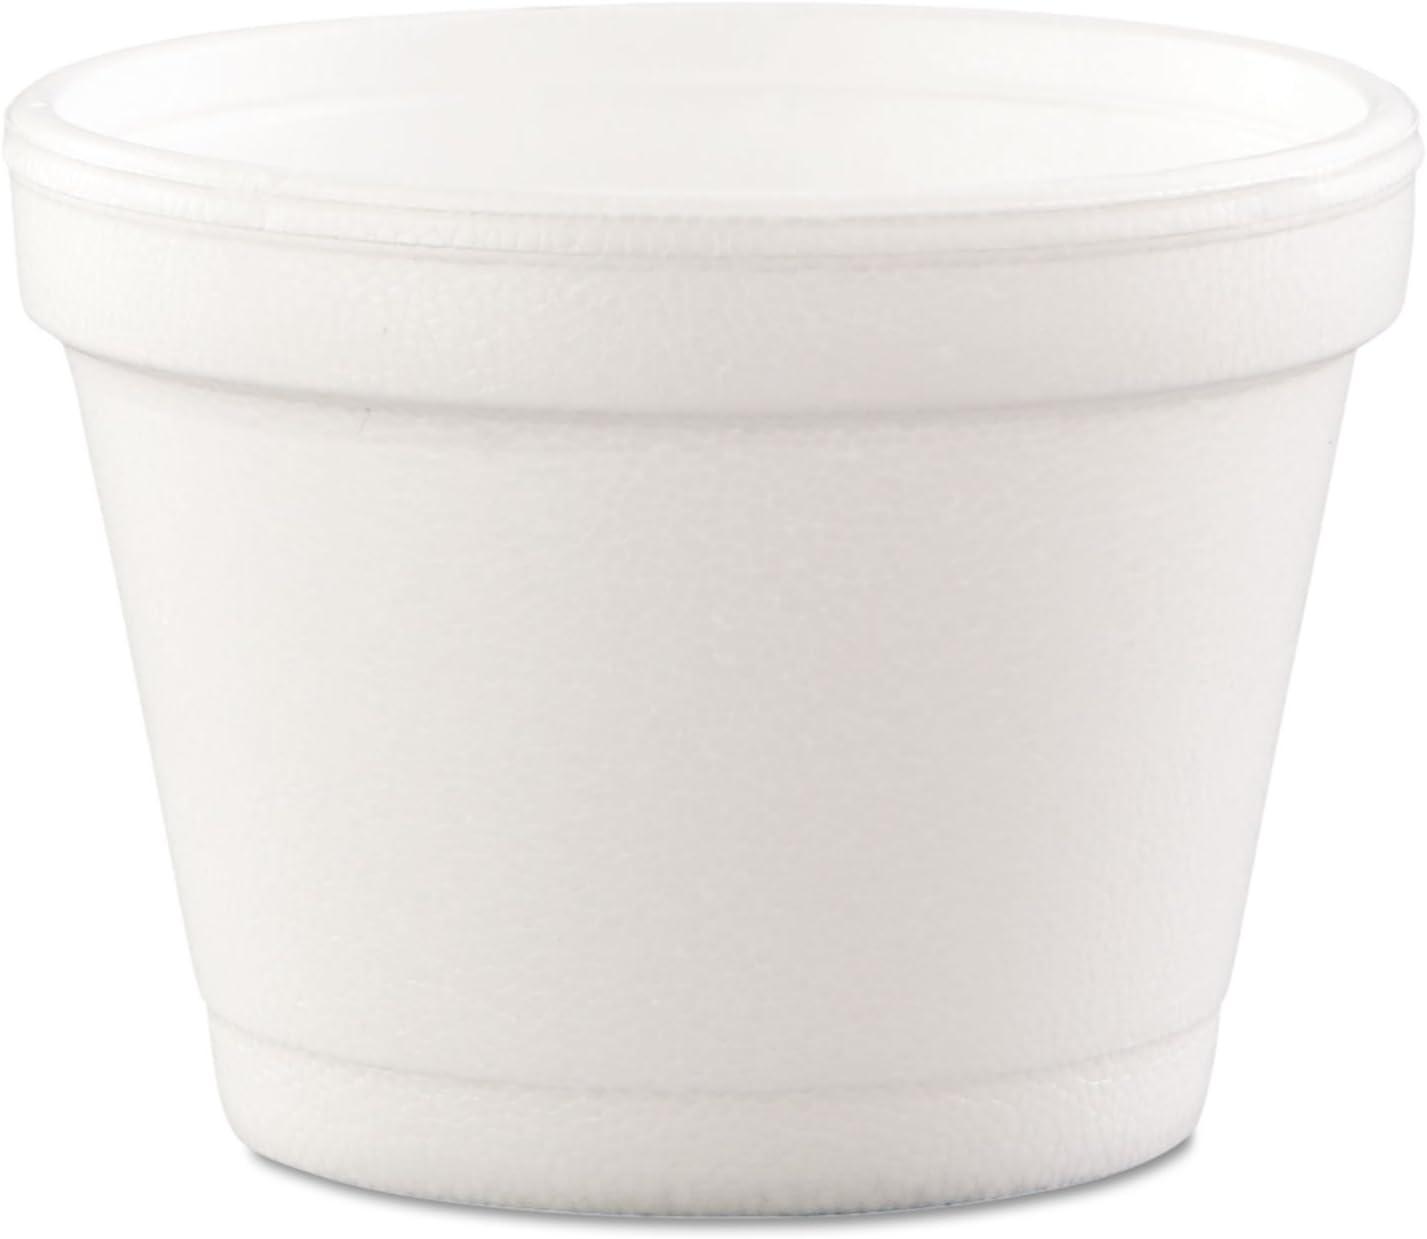 DART 4J6 Bowl Containers Foam Atlanta Mall 4oz Outlet SALE White Carton 1000